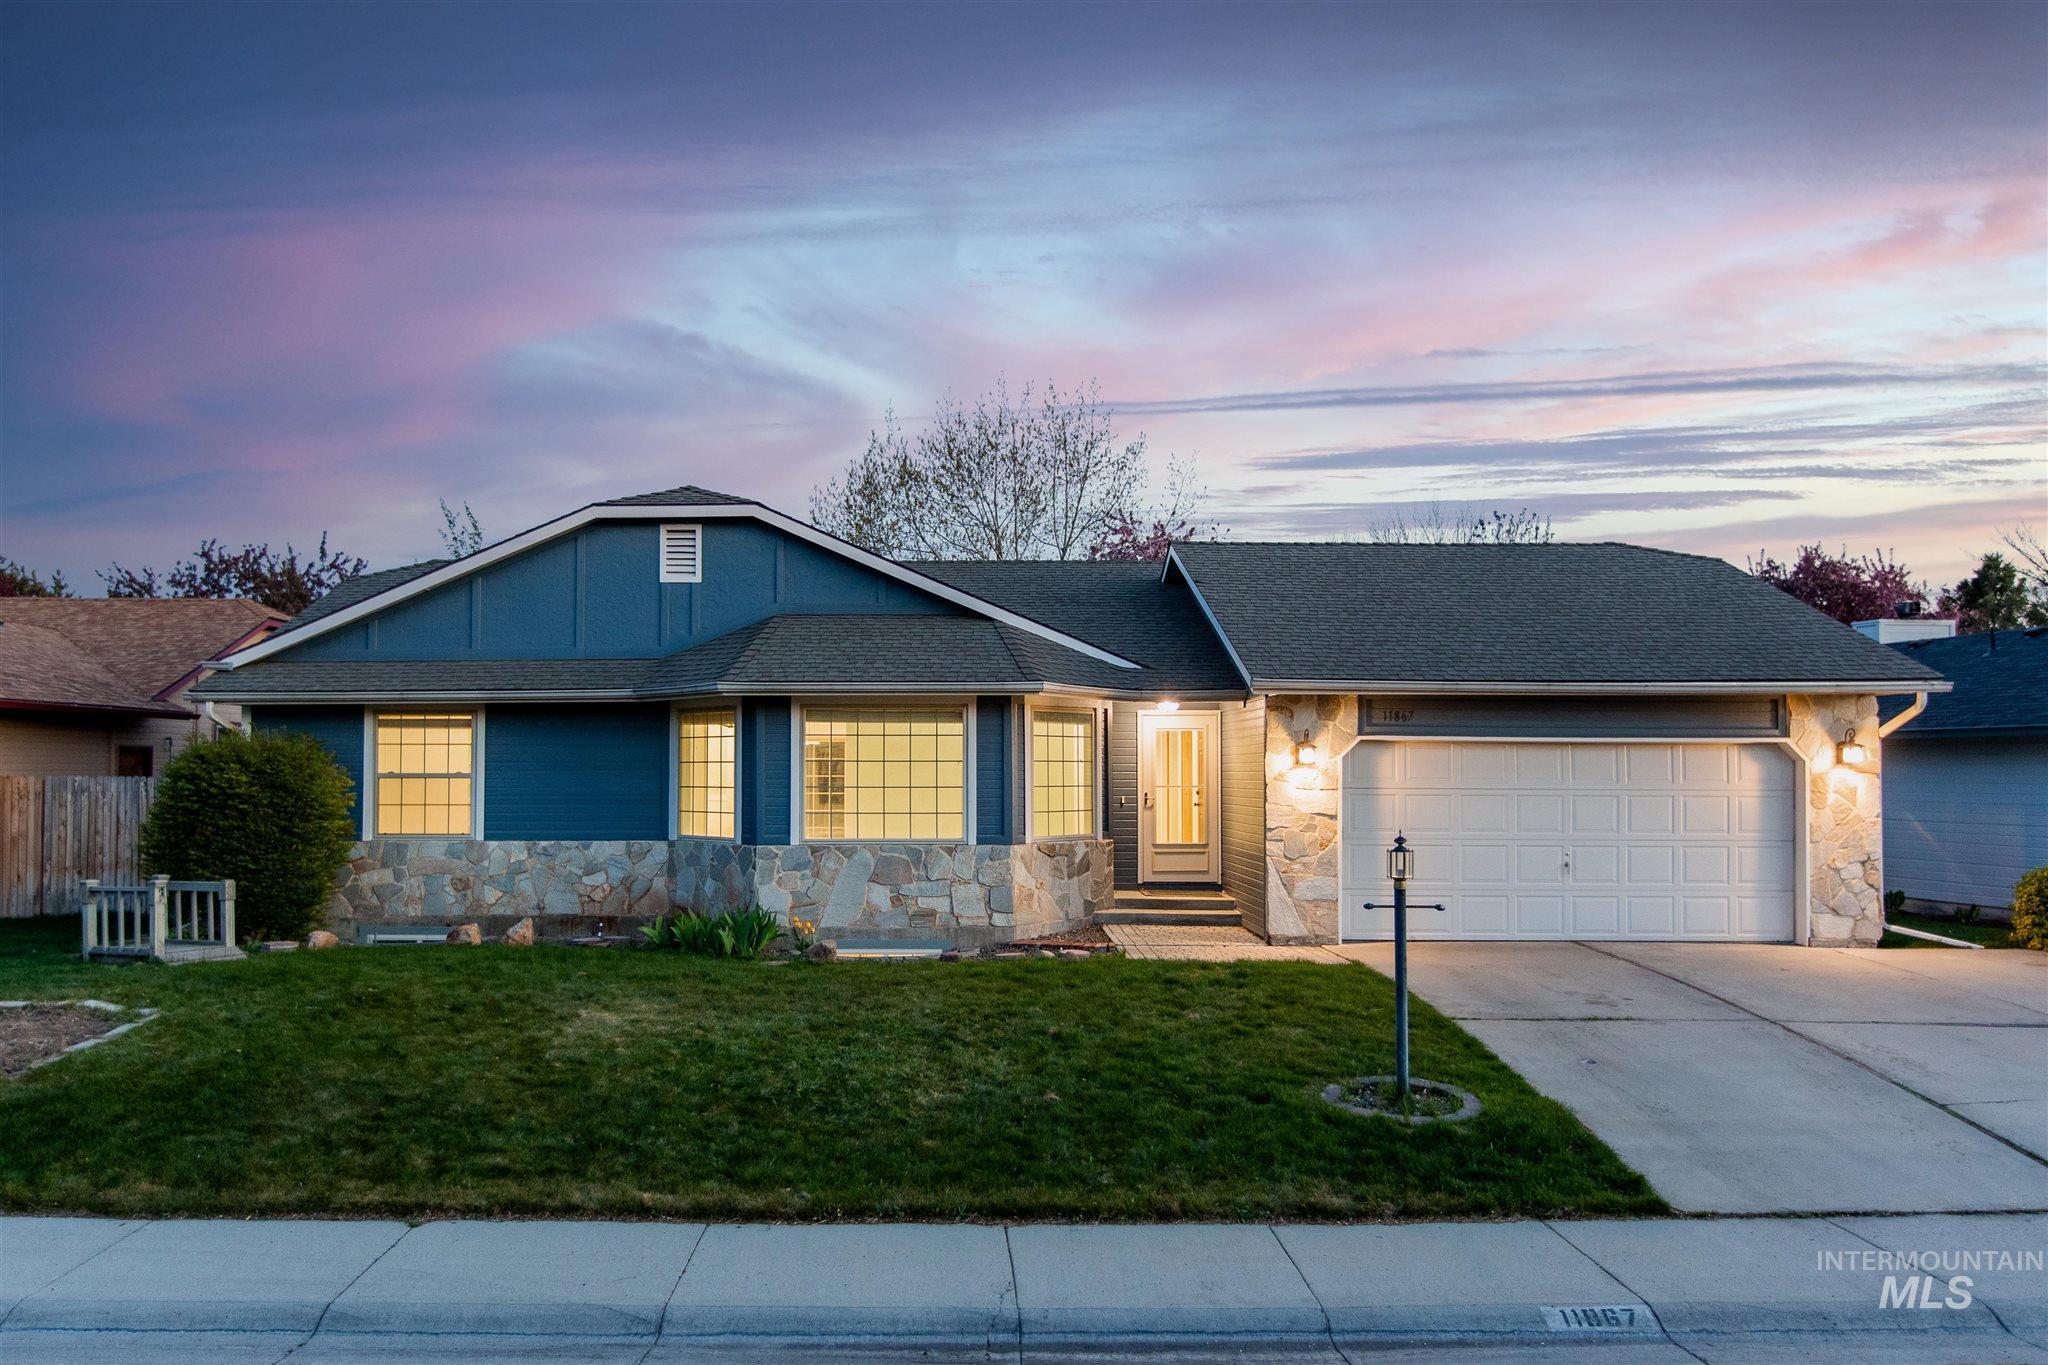 11867 W Flintlock Dr Property Photo - Boise, ID real estate listing